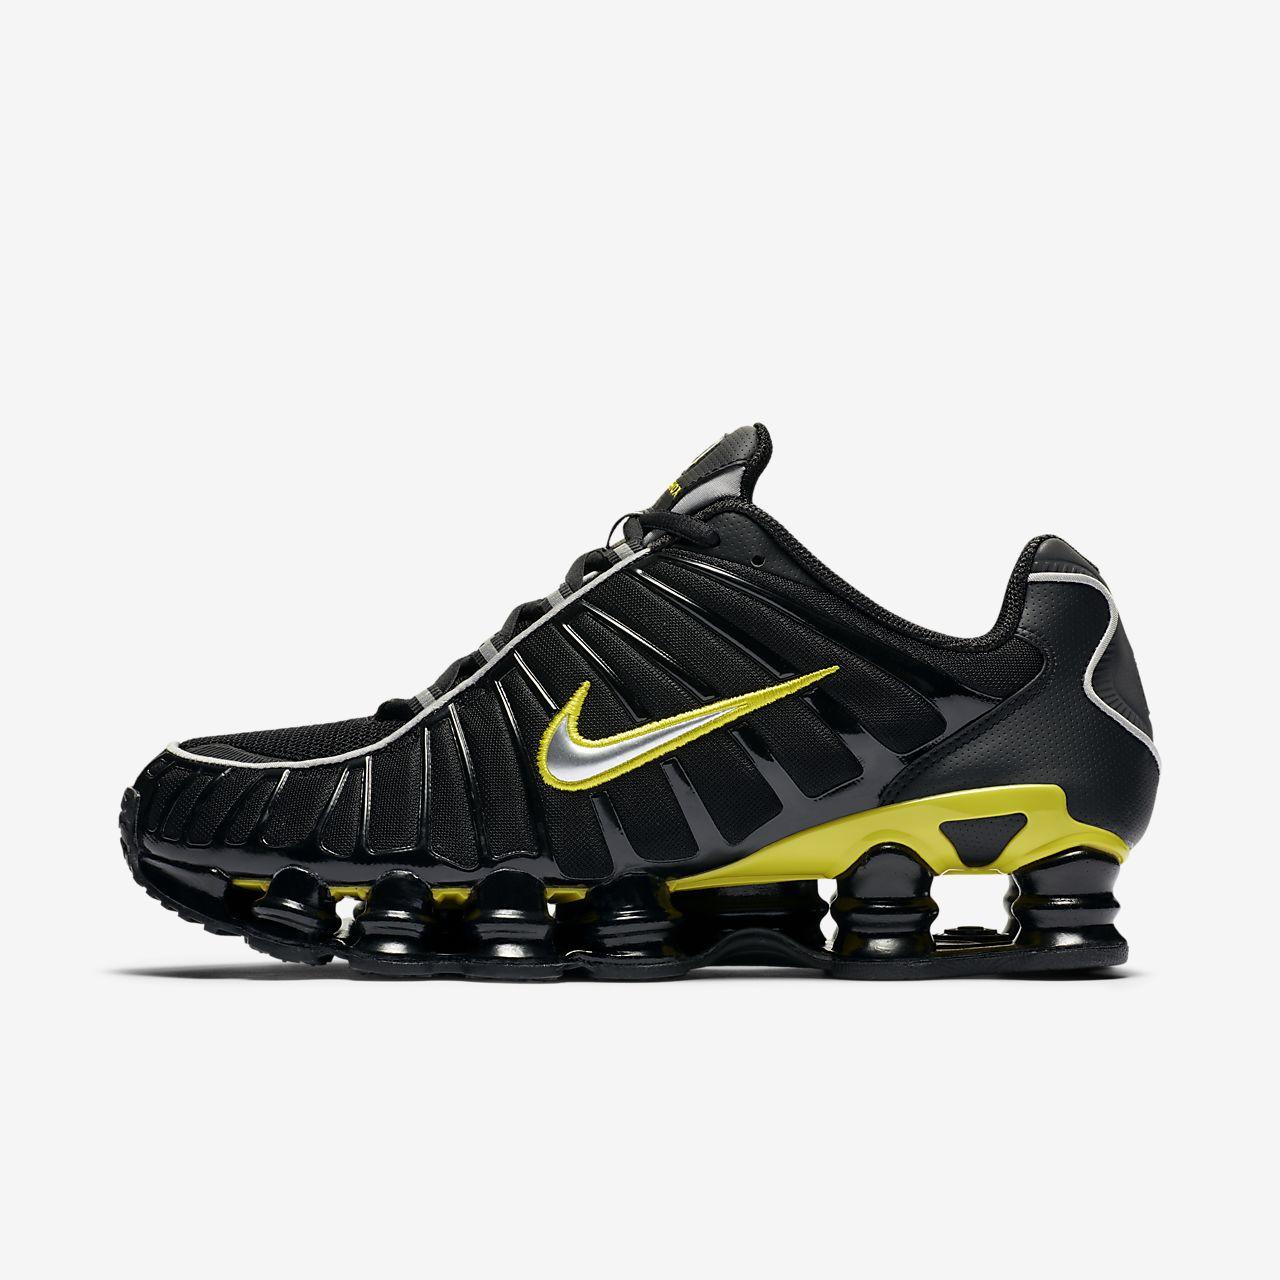 Tl Chaussure Shox Nike Pour Homme LVUqSzpjMG